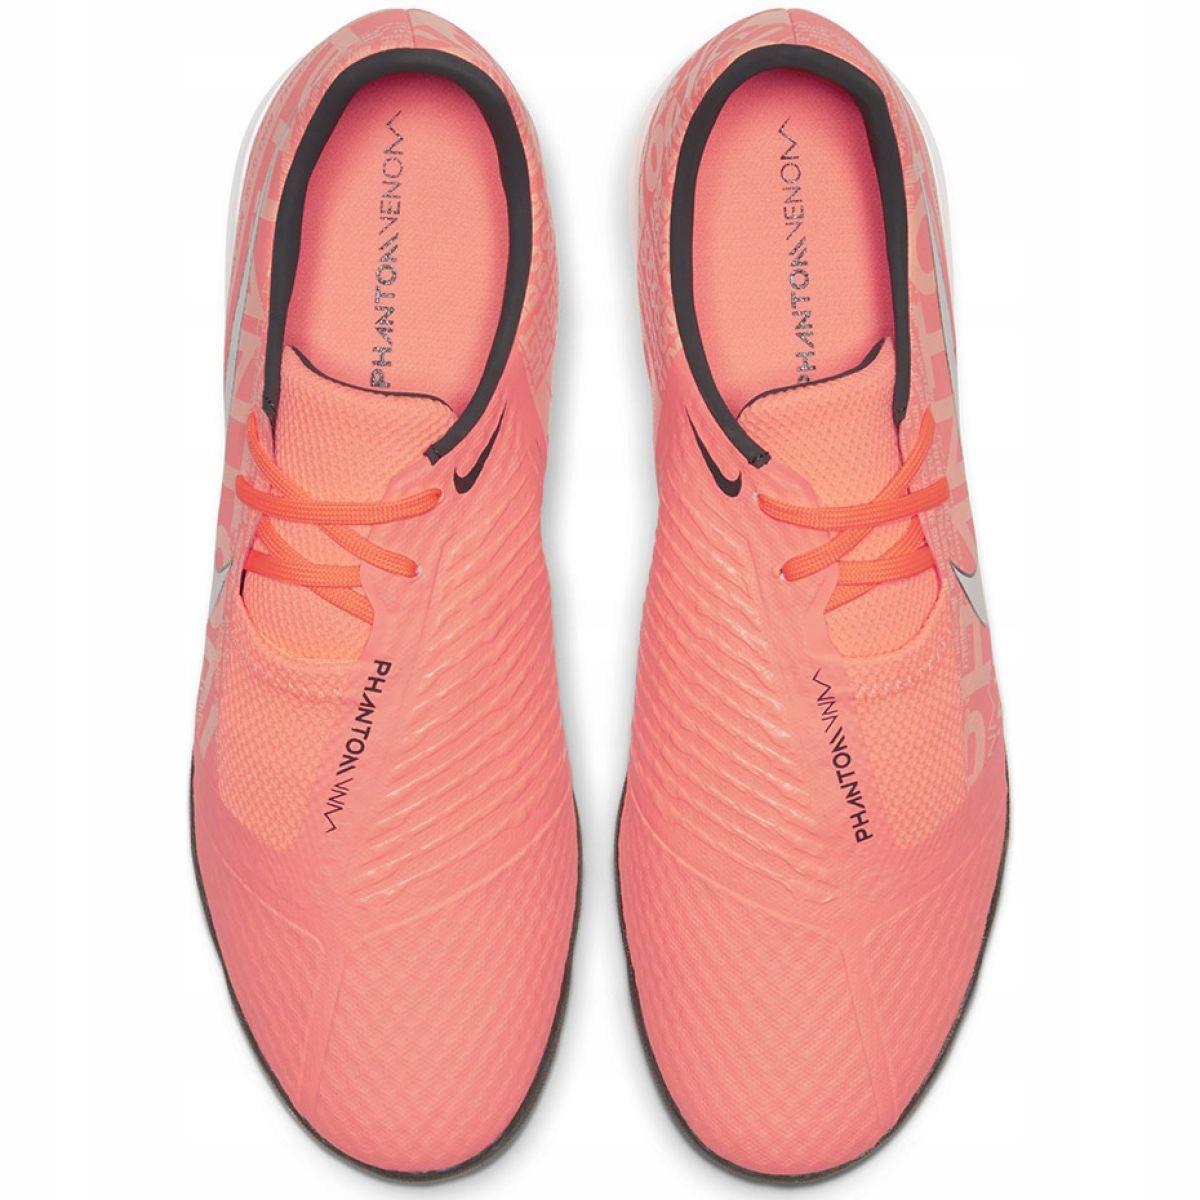 Detalles de Zapatillas de interior Nike Phantom Venom Academy Ic M AO0570 810 naranja